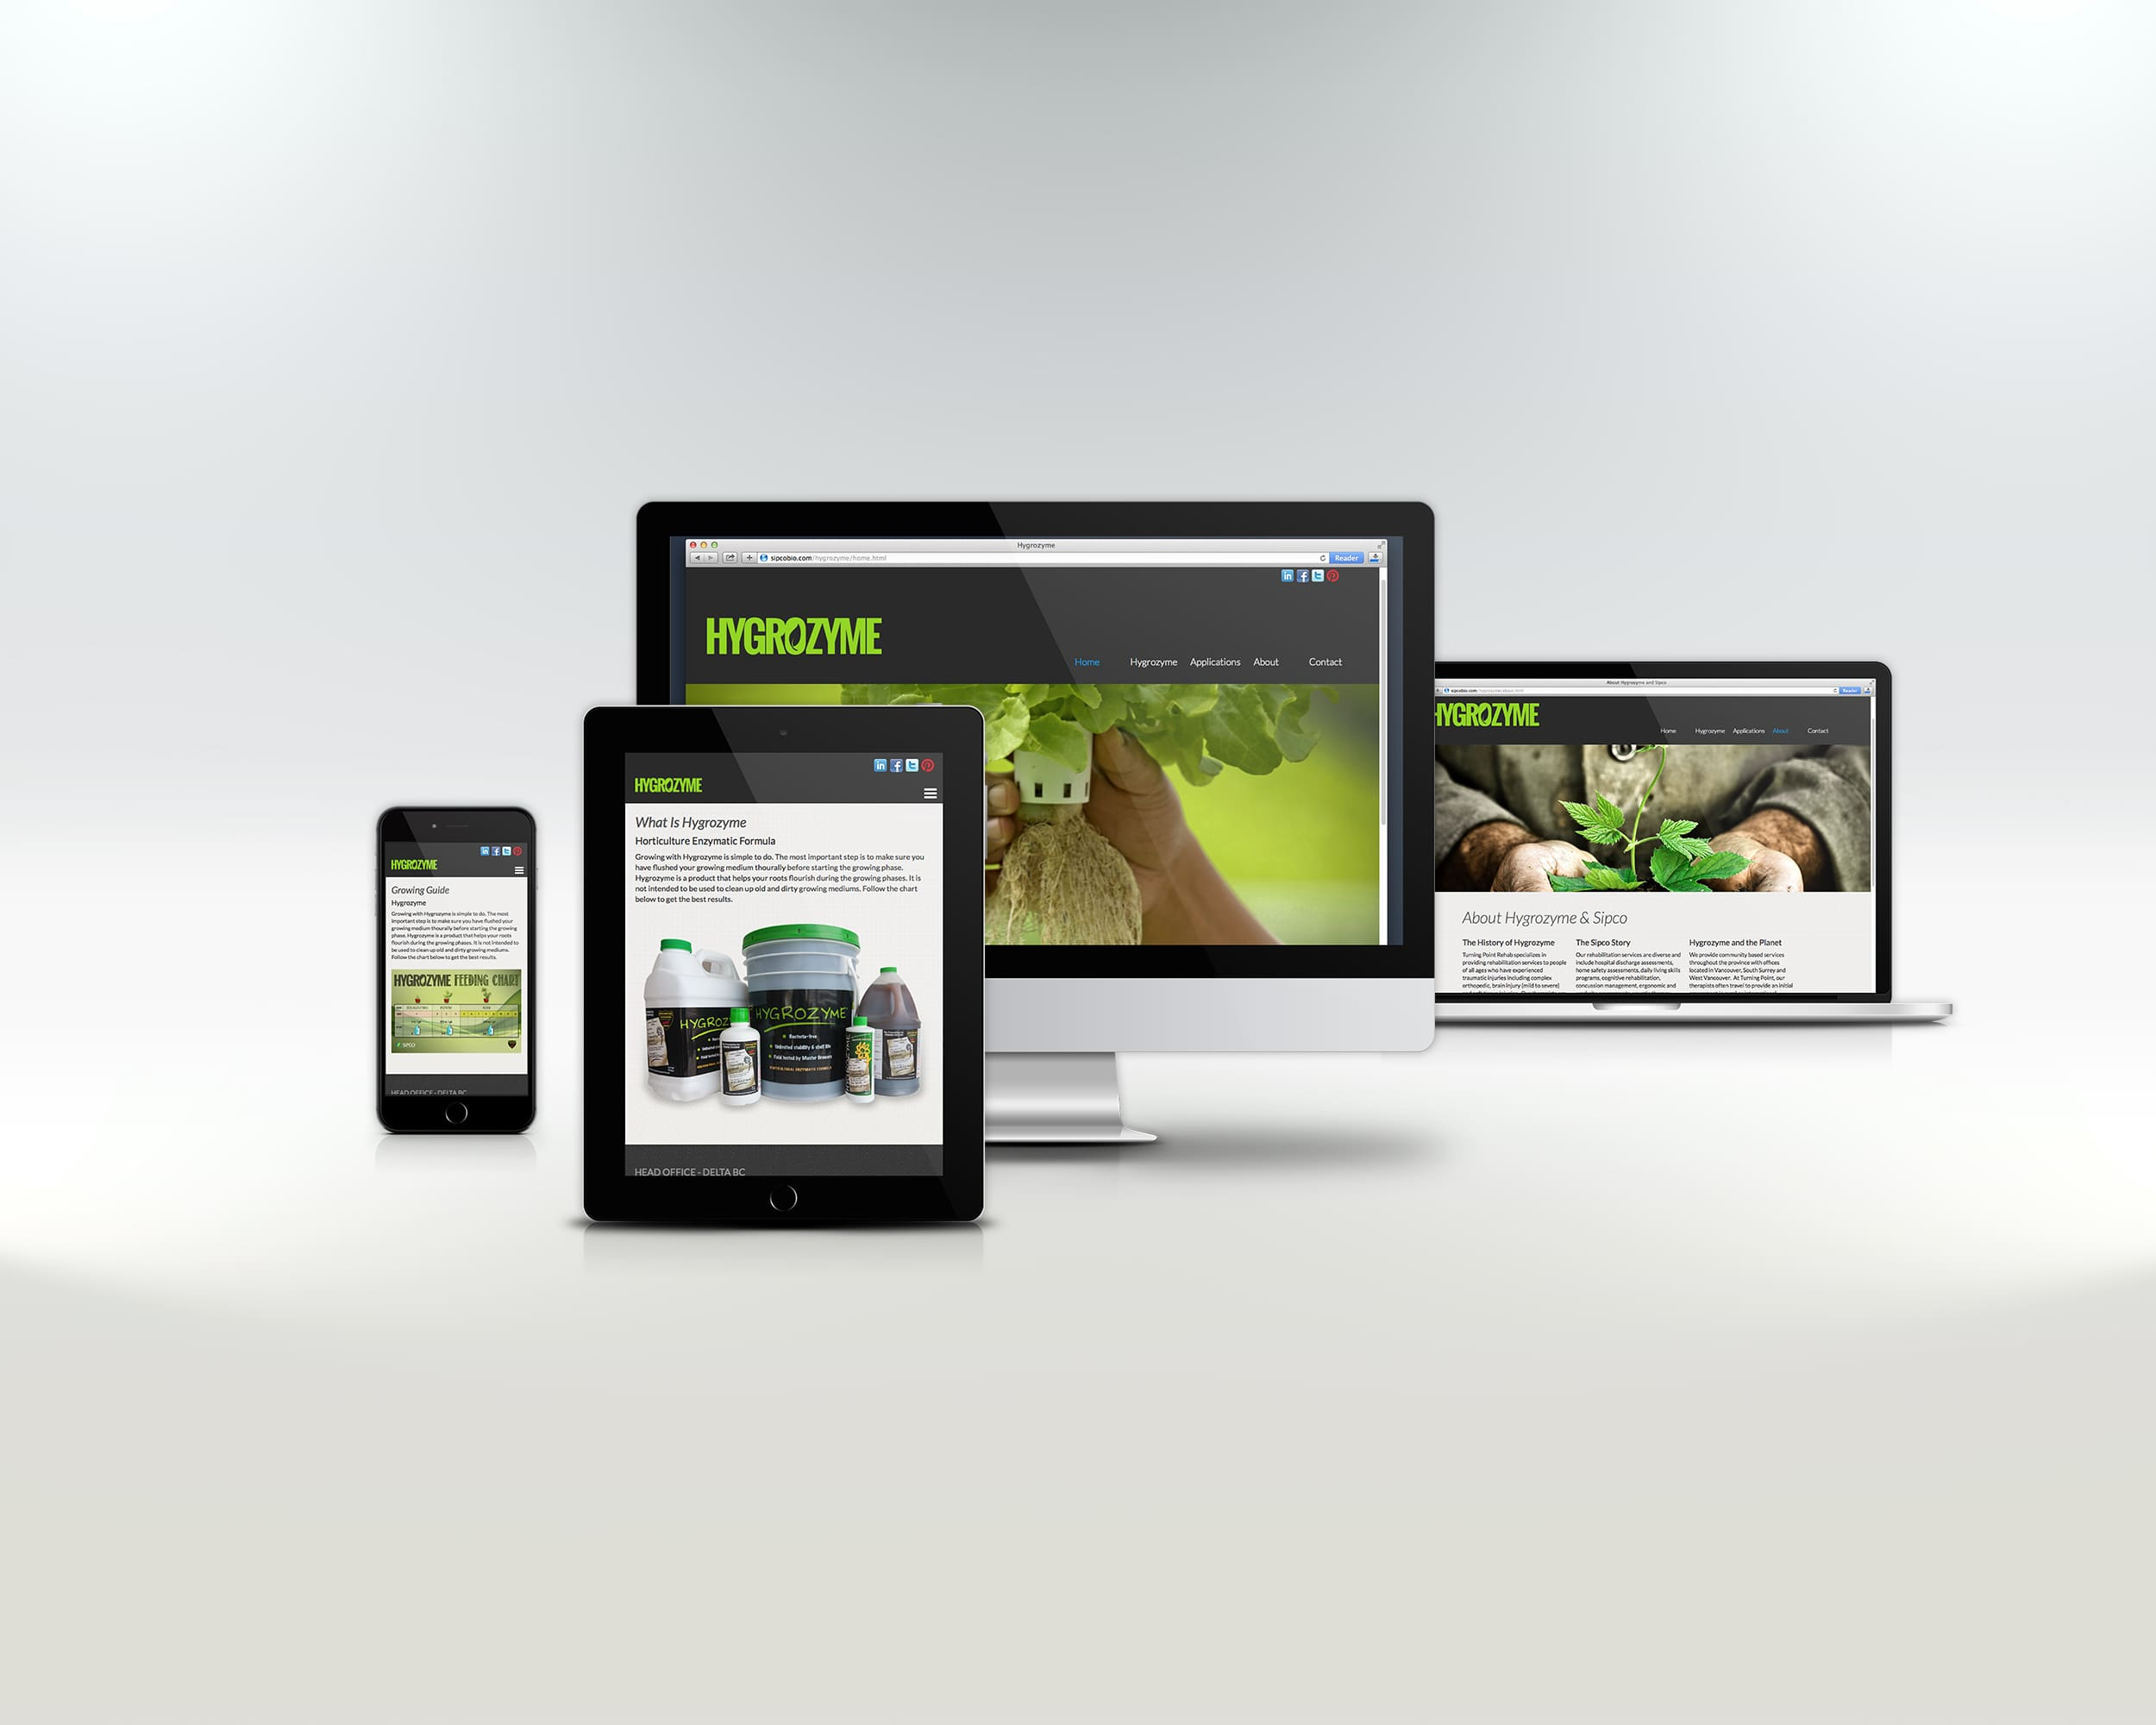 https://www.ravensfoot.com/2019/wordpress/wp-content/uploads/2019/02/hygrow-website-design-1.jpg